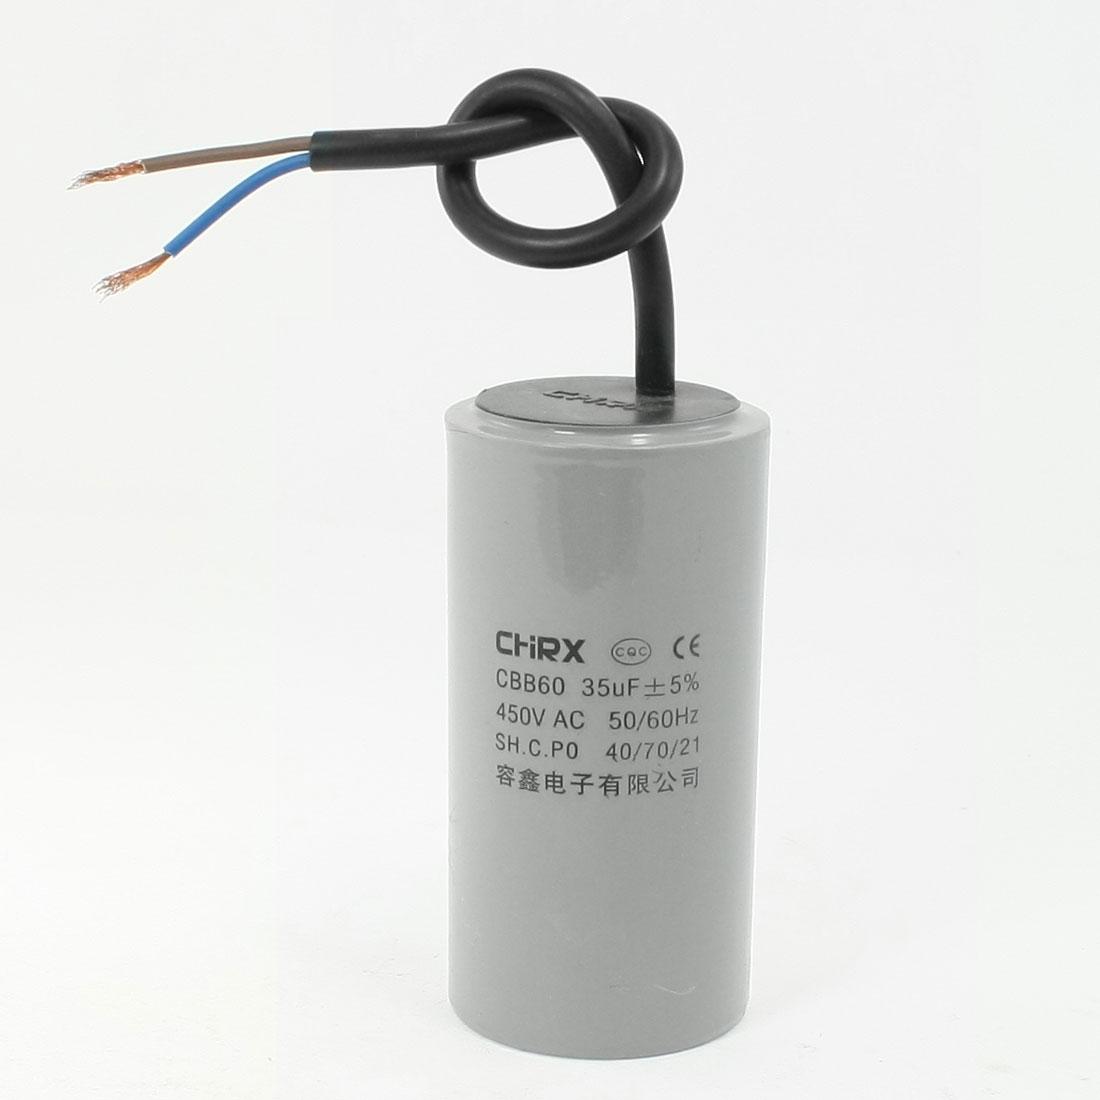 CBB60 AC 450V 35uF Polypropylene Film Motor Running Capacitor Gray